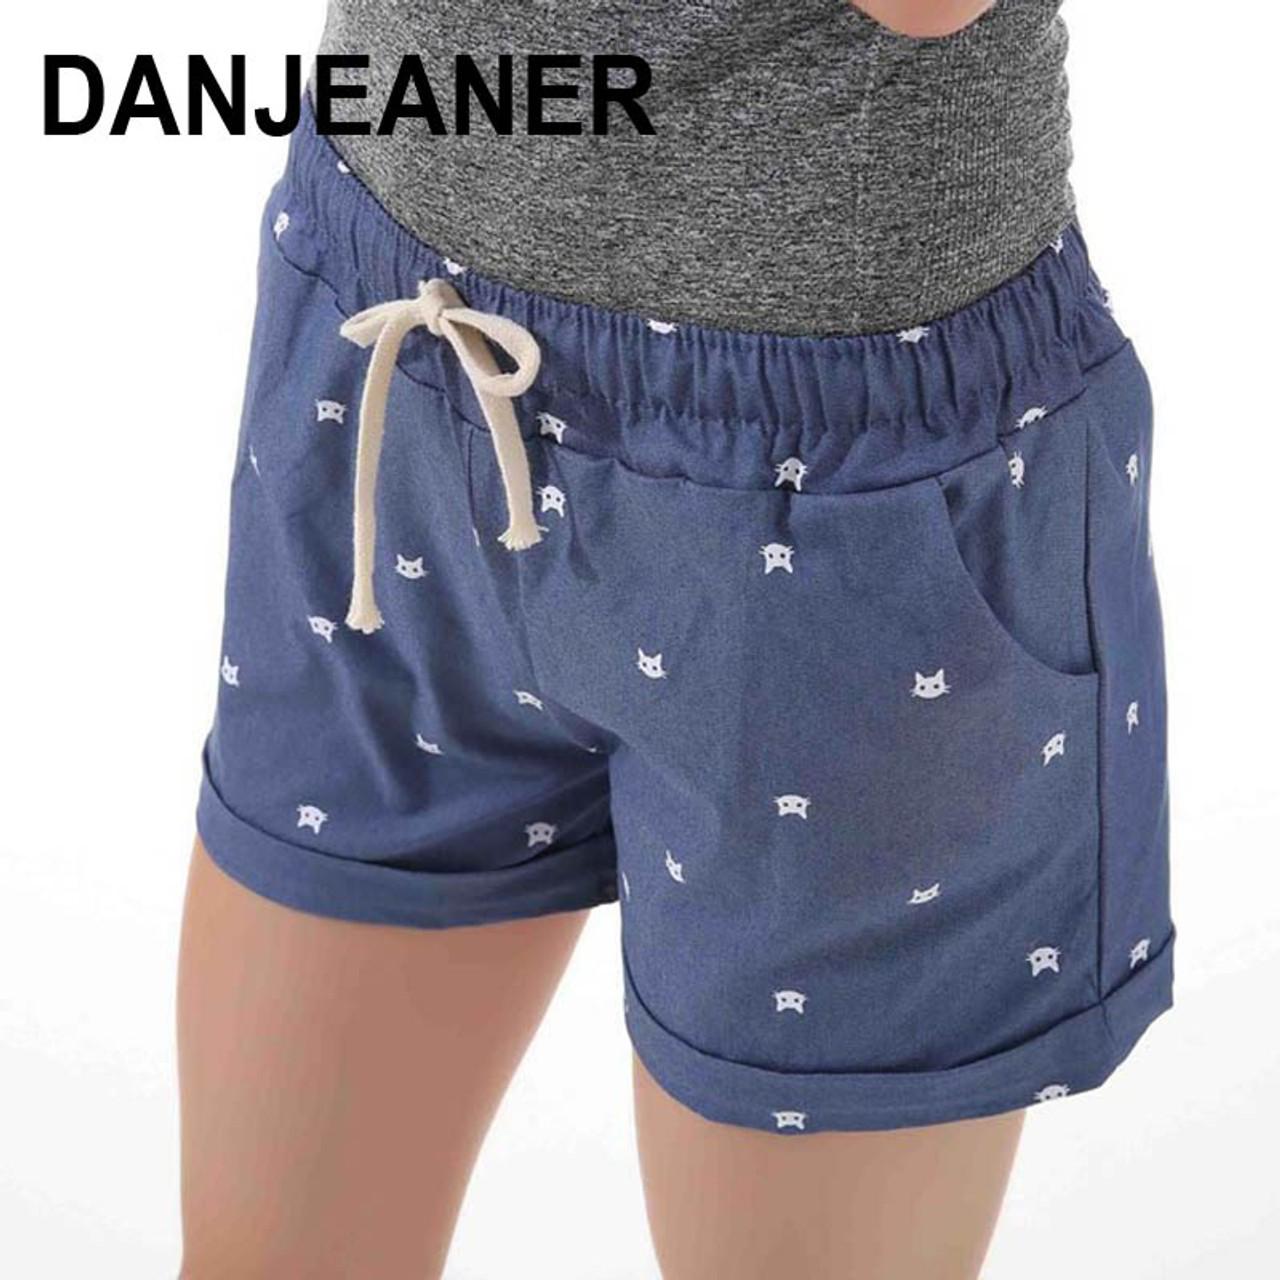 d65520944 2017 Brand New Summer Women Casual Elastic Waist Cotton Shorts Printed Cat  Drawstring Slim Shorts Candy ...